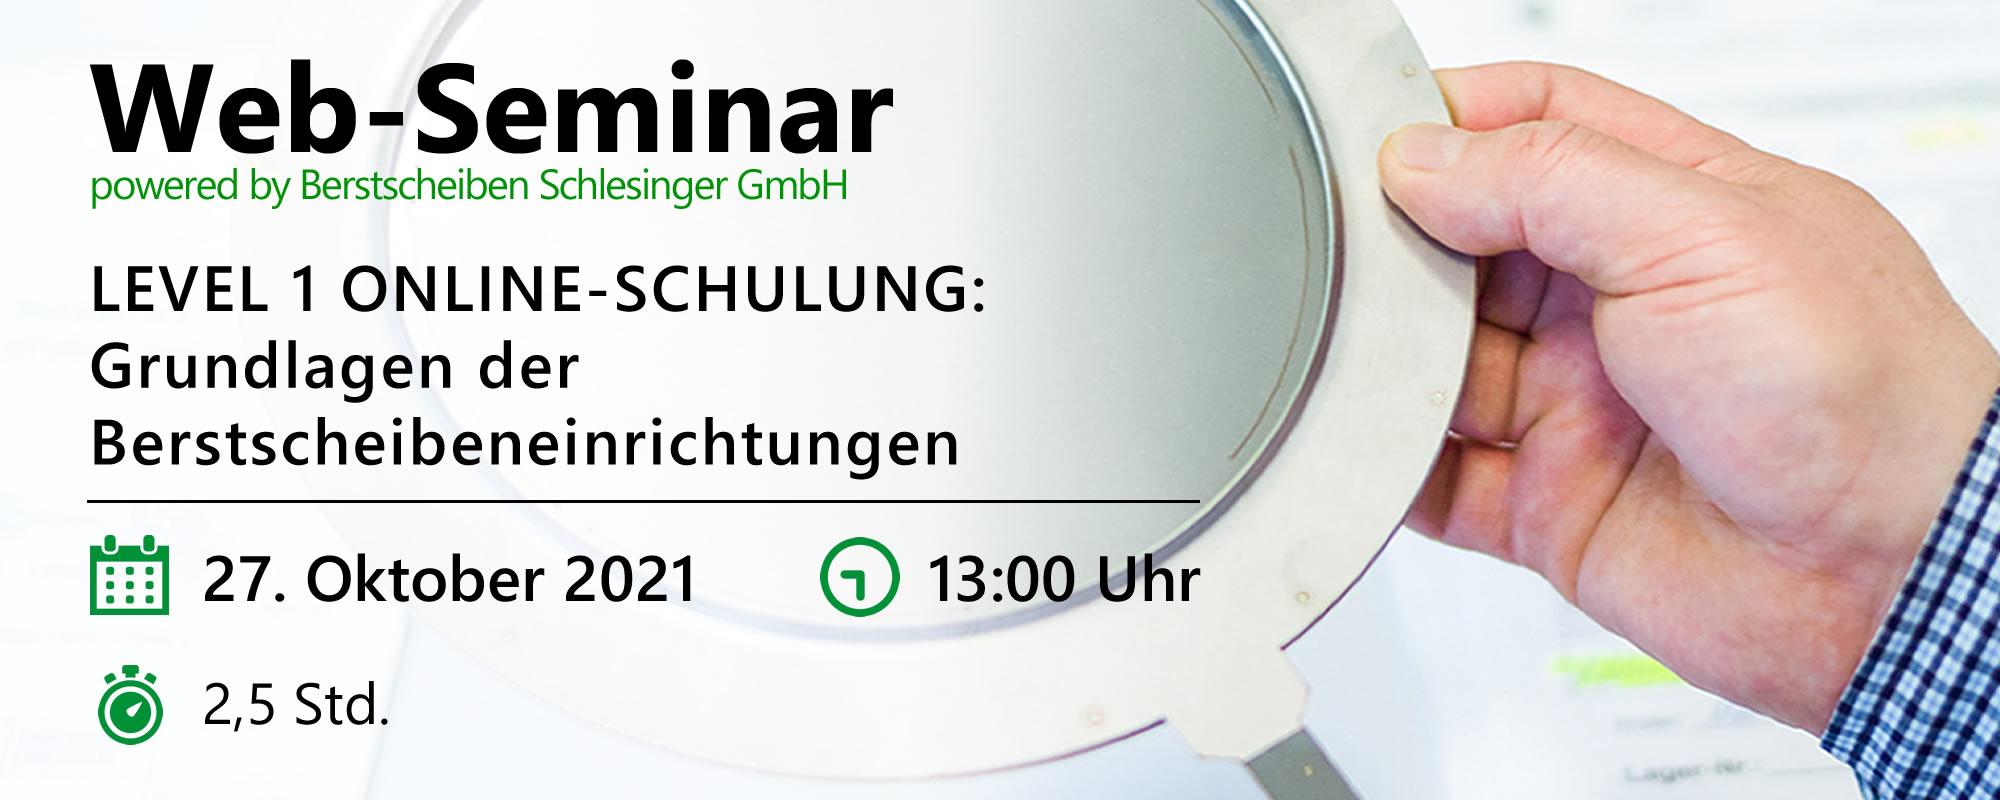 Web-Seminar am 27.10.2021